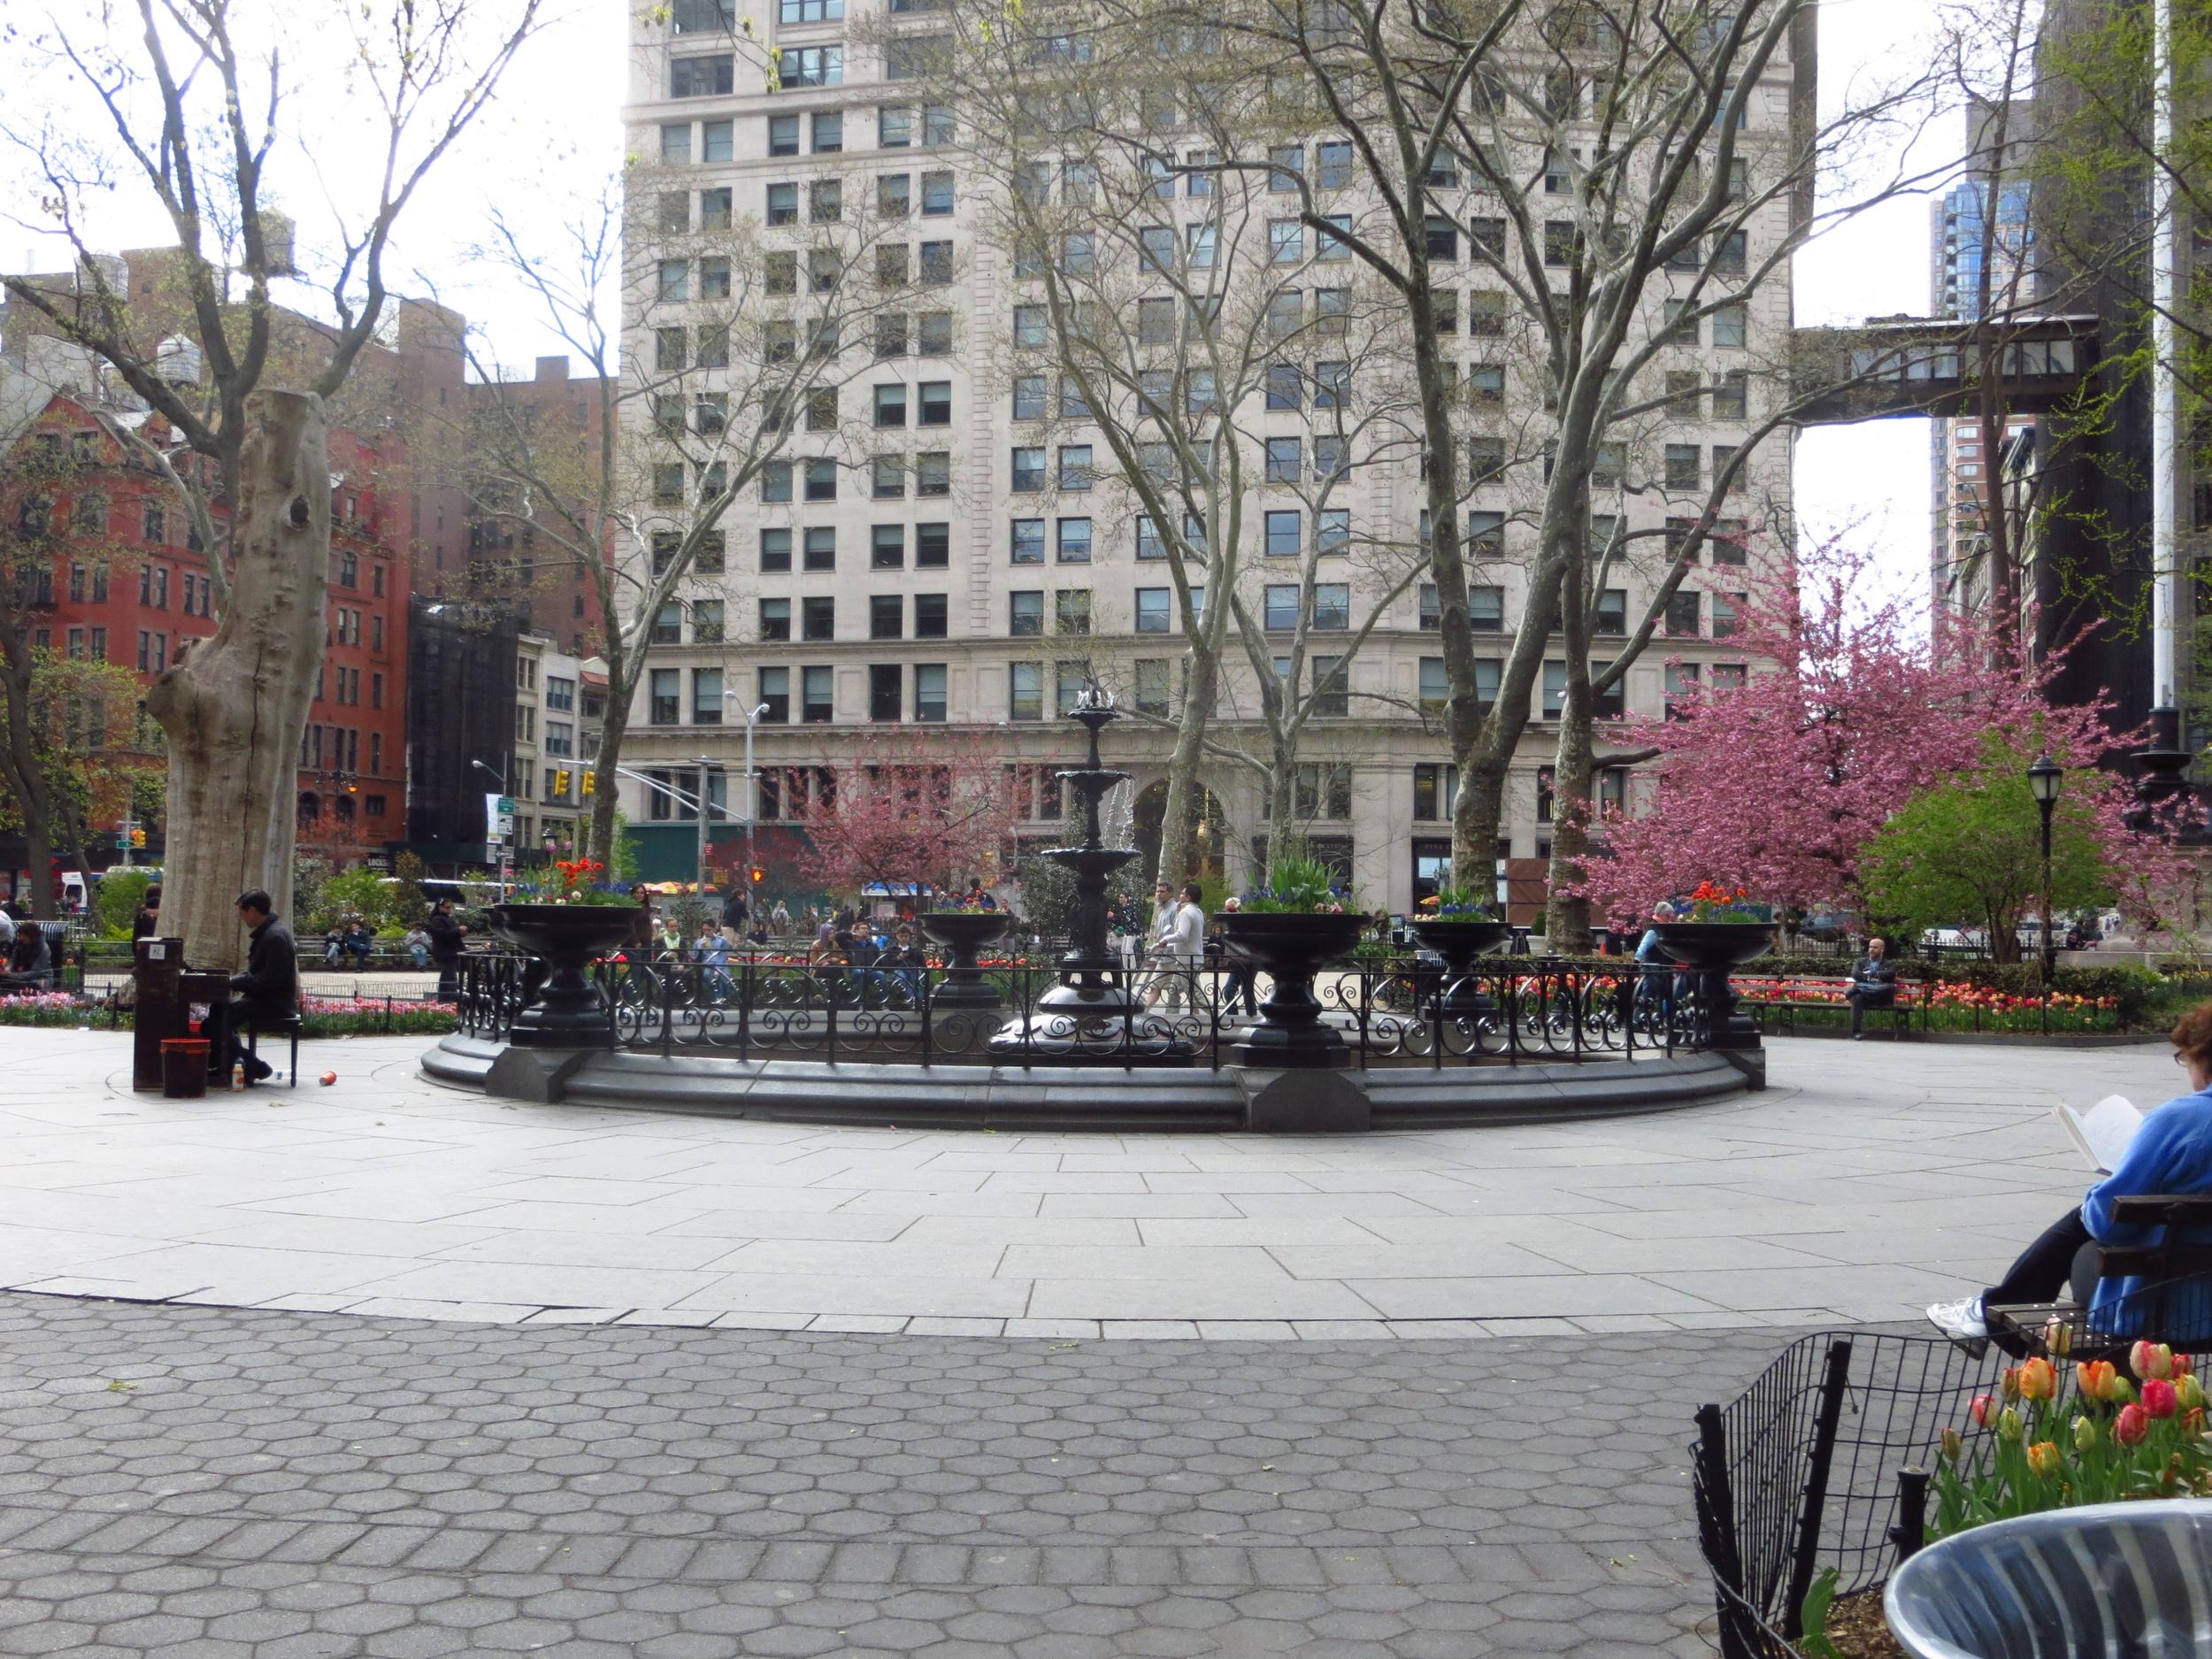 Piano in Madison Square Park